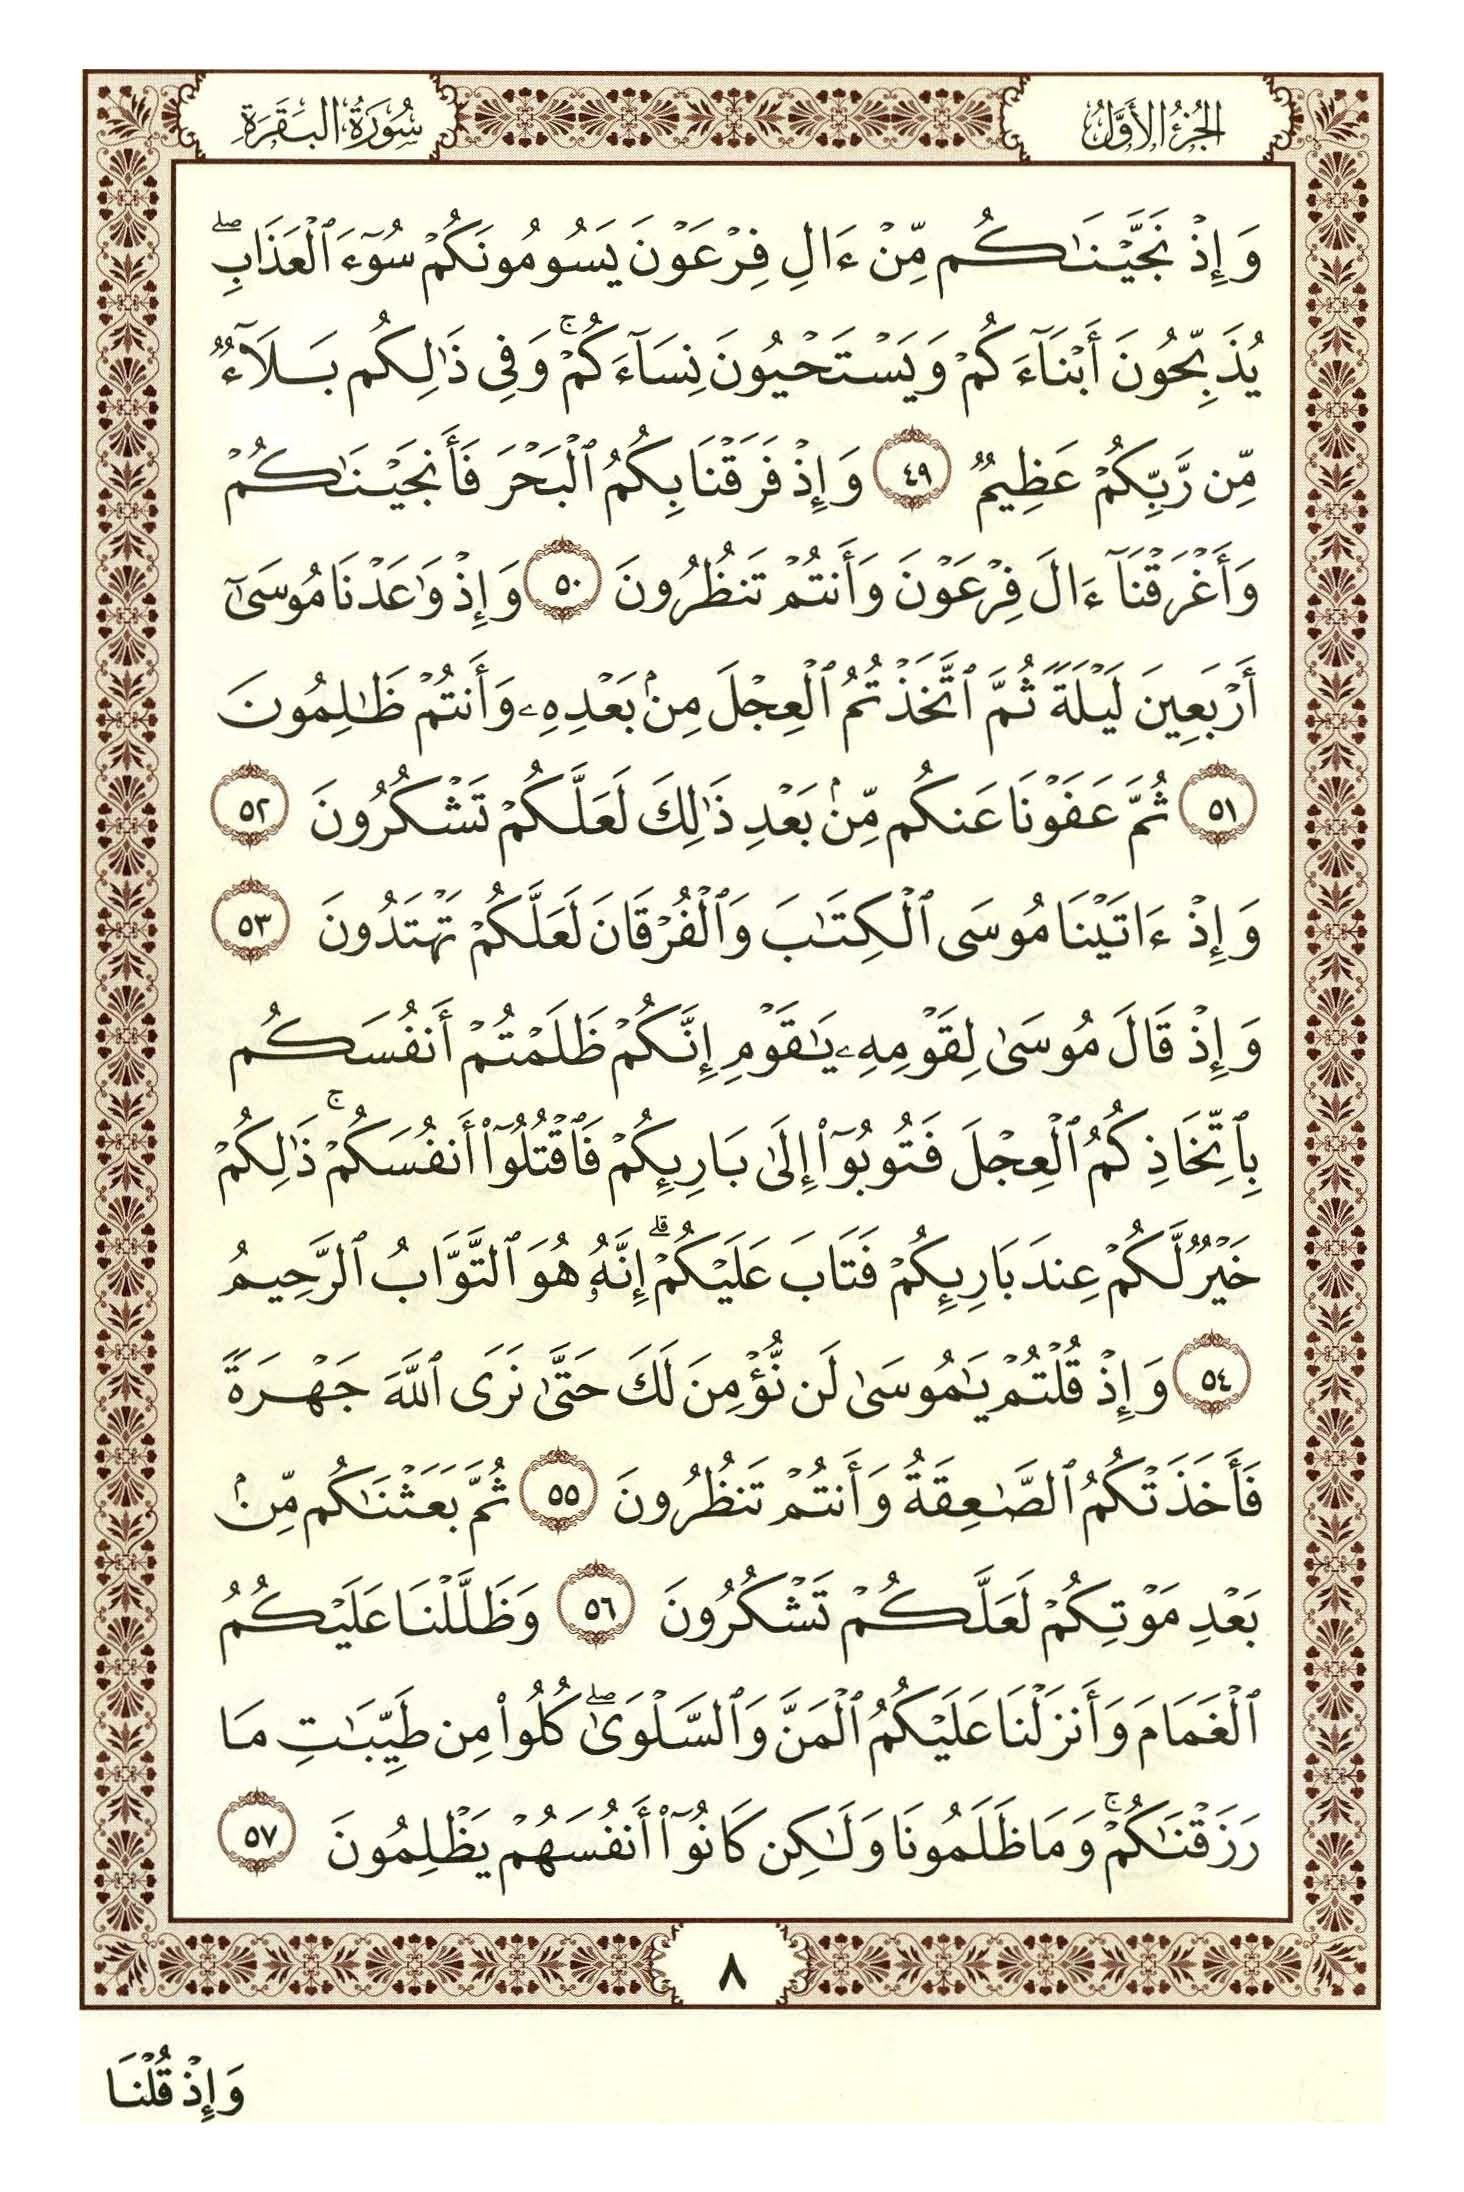 Pin By القران الكريم The Holy Quran On القران الكريم مصحف دولة الكويت The Holy Quran Le Saint Coran Quran Verses Verses Bullet Journal